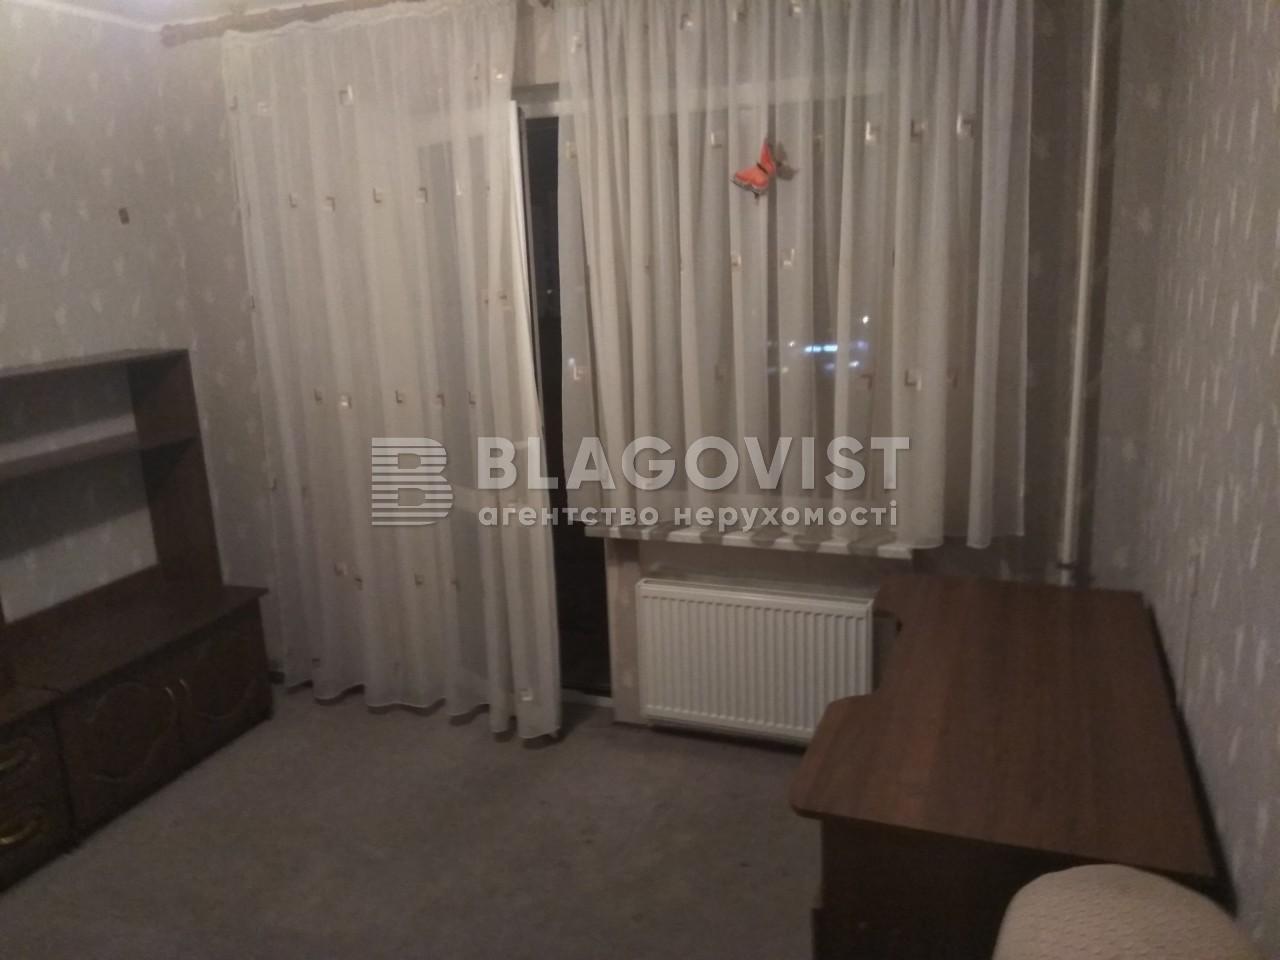 Квартира R-6603, Градинская, 6, Киев - Фото 11